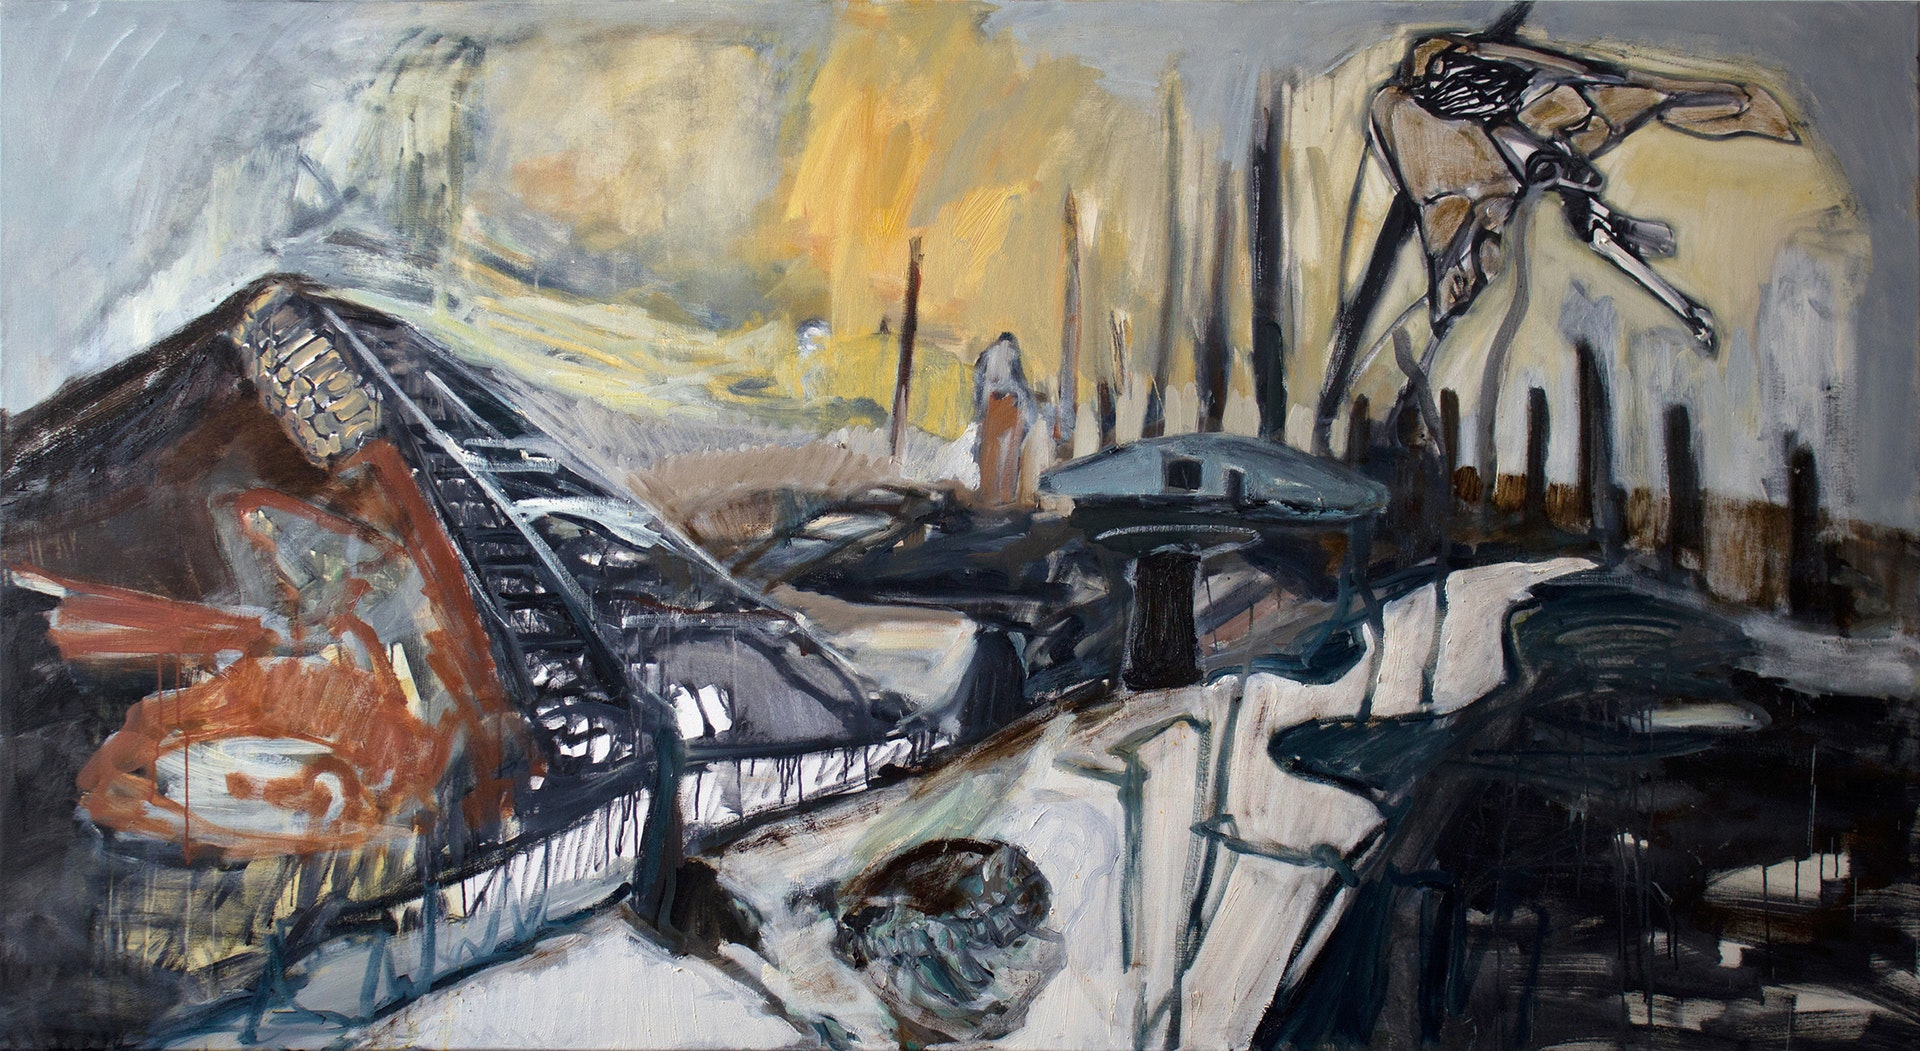 'The Valley 1', Steph Goodger, Oil on canvas, 120 x 220 cm